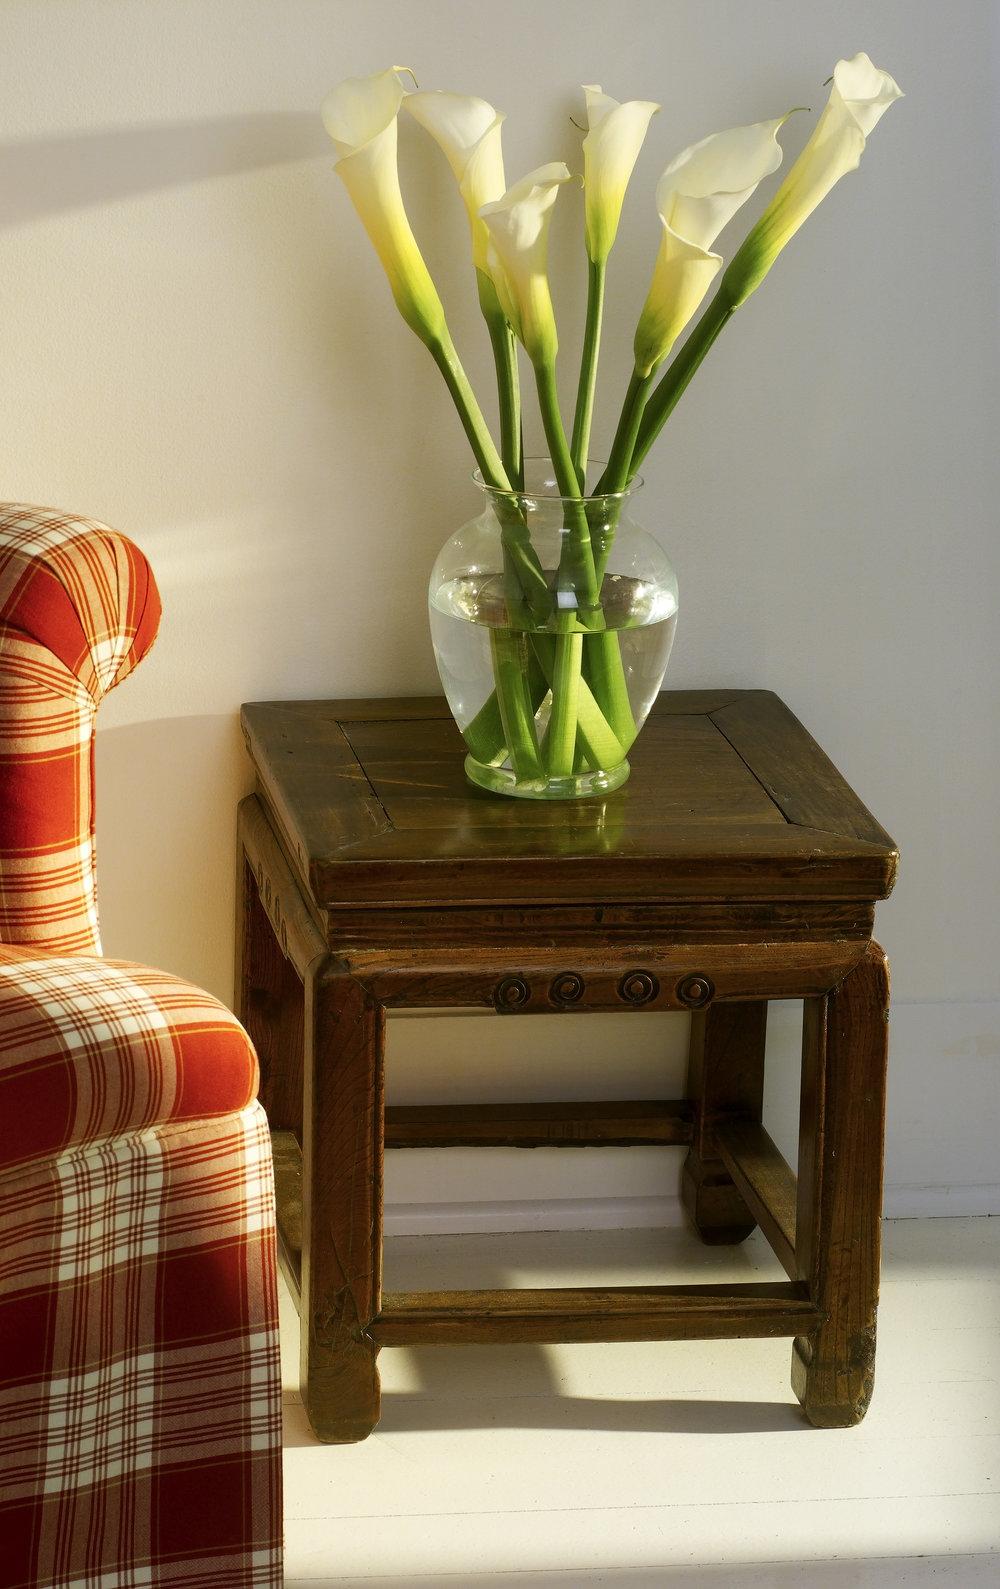 20031216.Chebeague.Lilies&Table.jpg